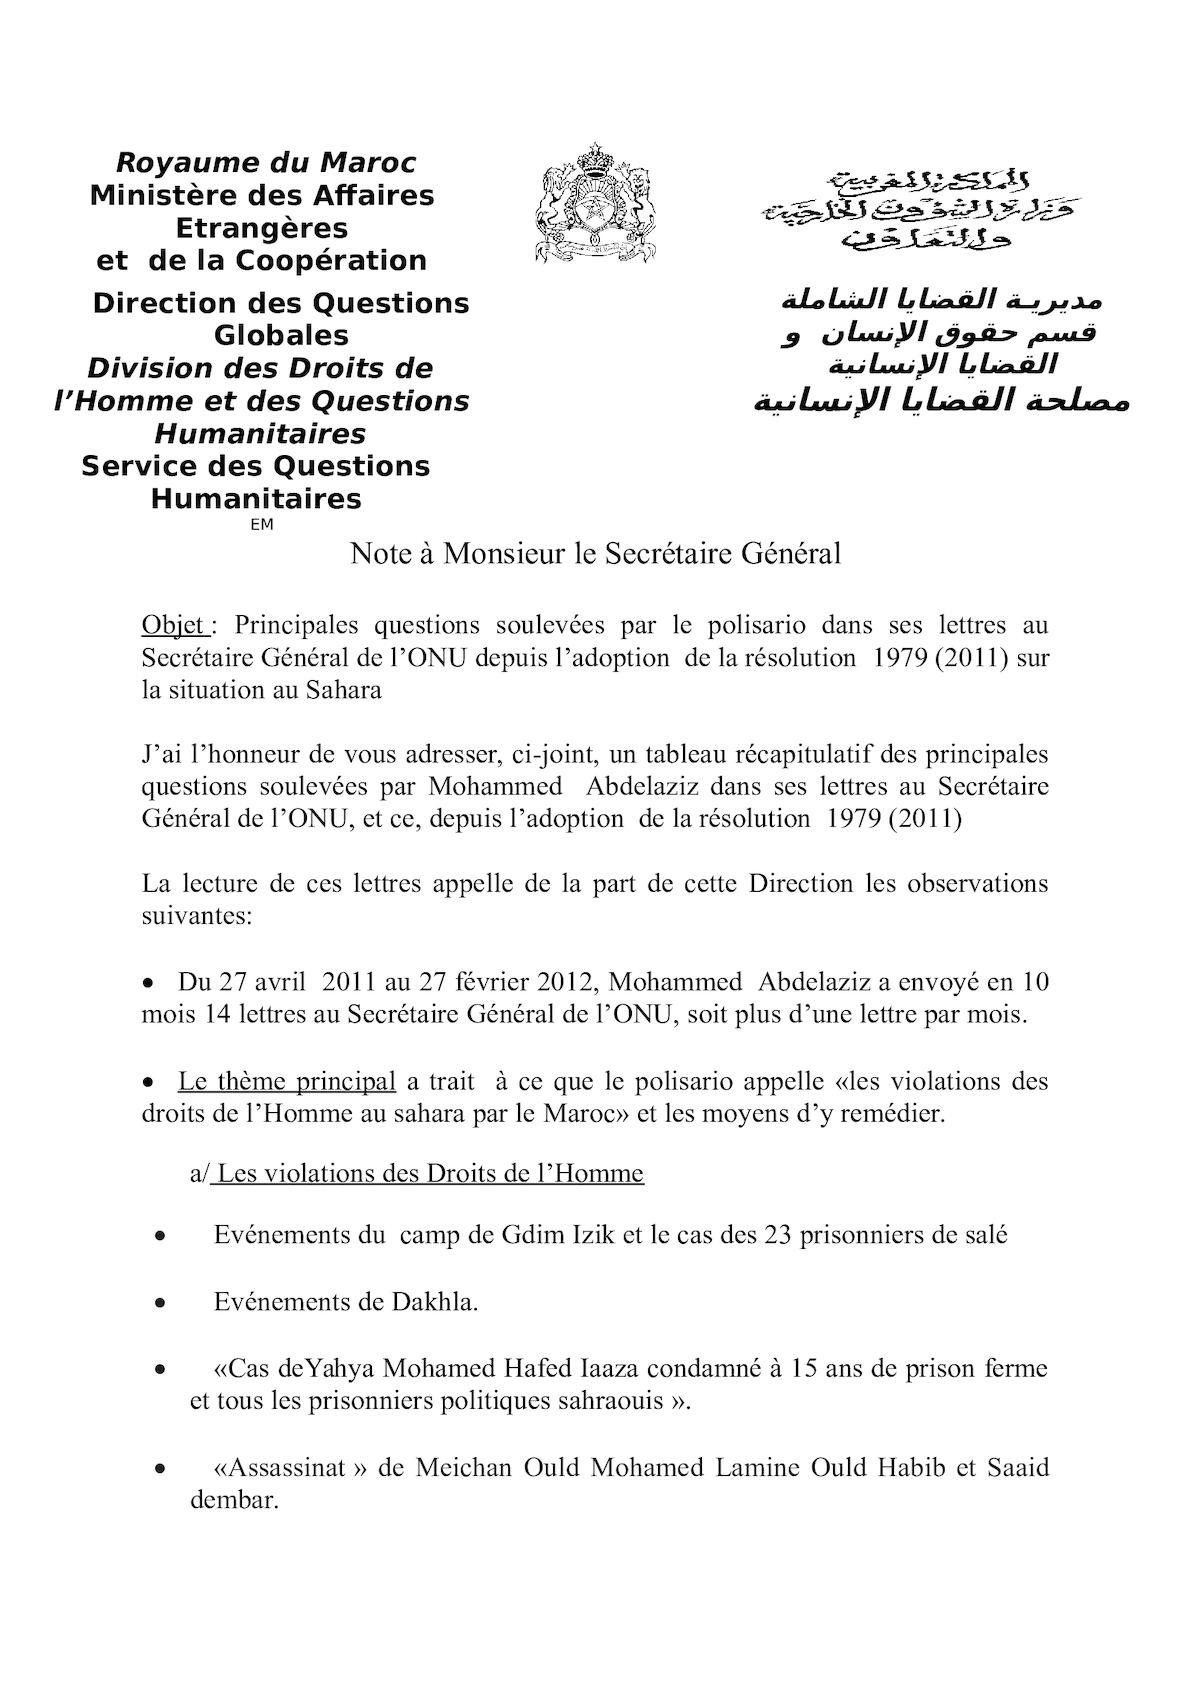 Note1 Lettres Abdelaziz Au Sg De L'onu